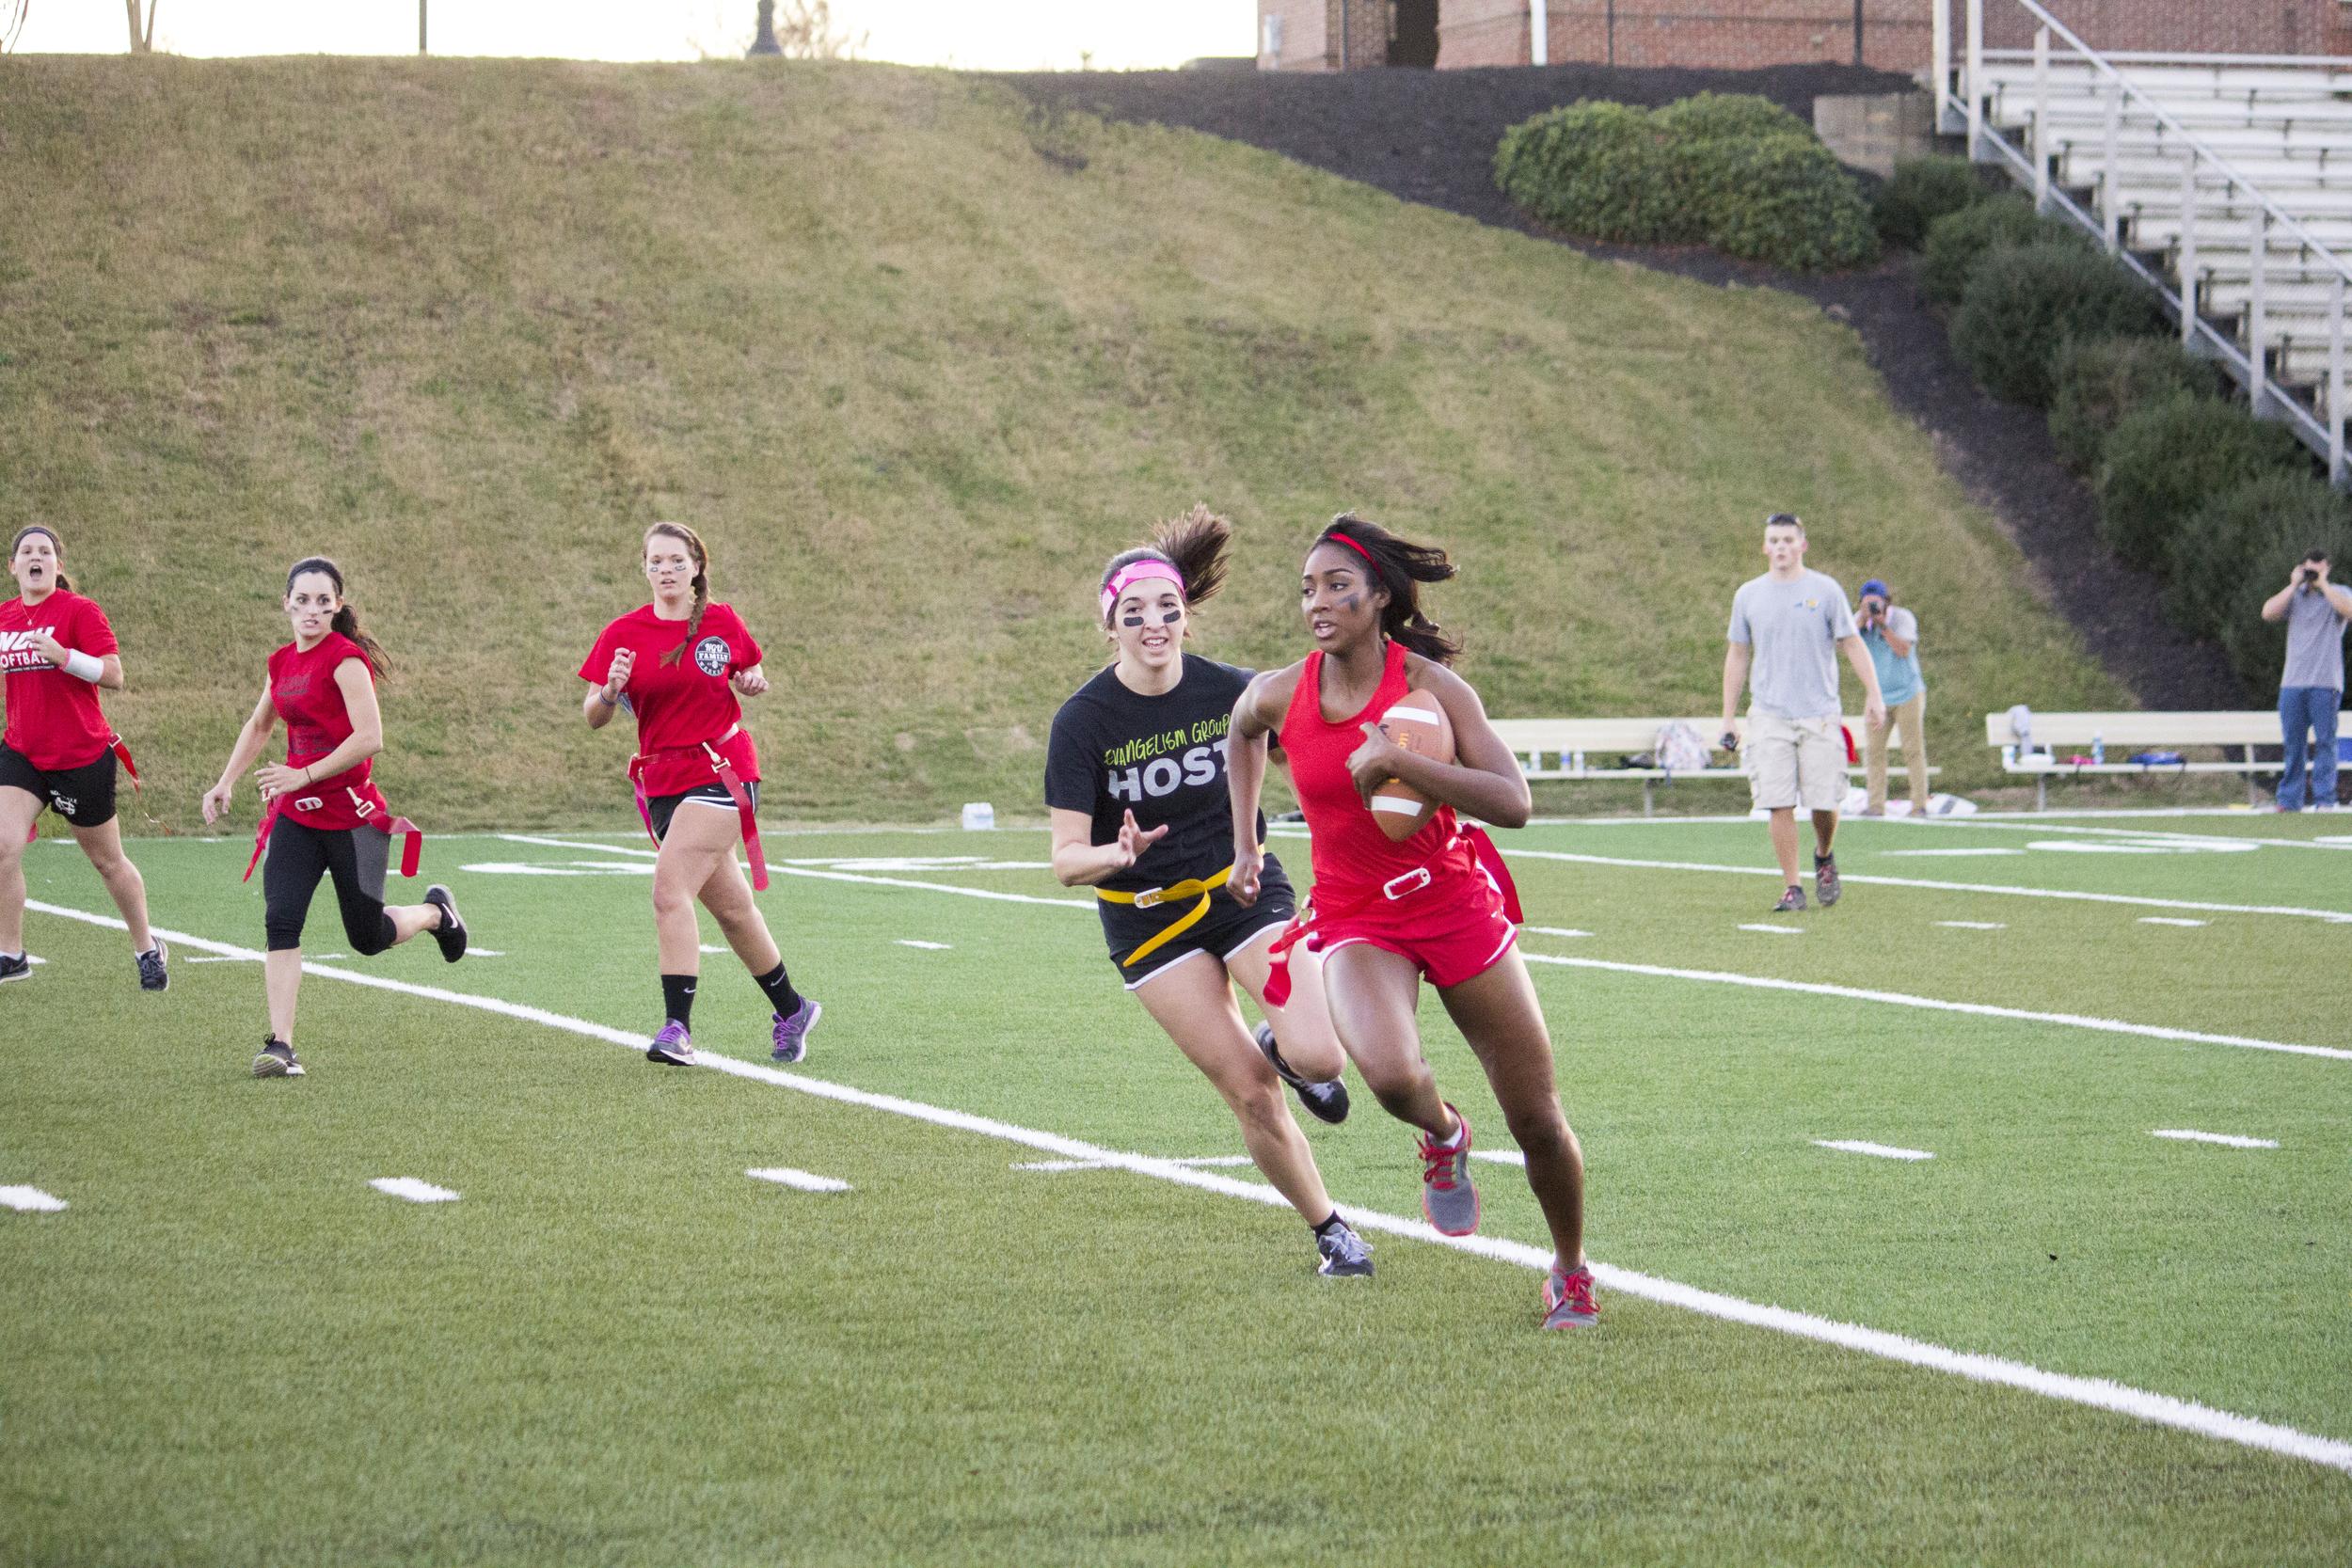 Junior Libby Sherer races downfield towards senior Jakia Whetstone to end the play.